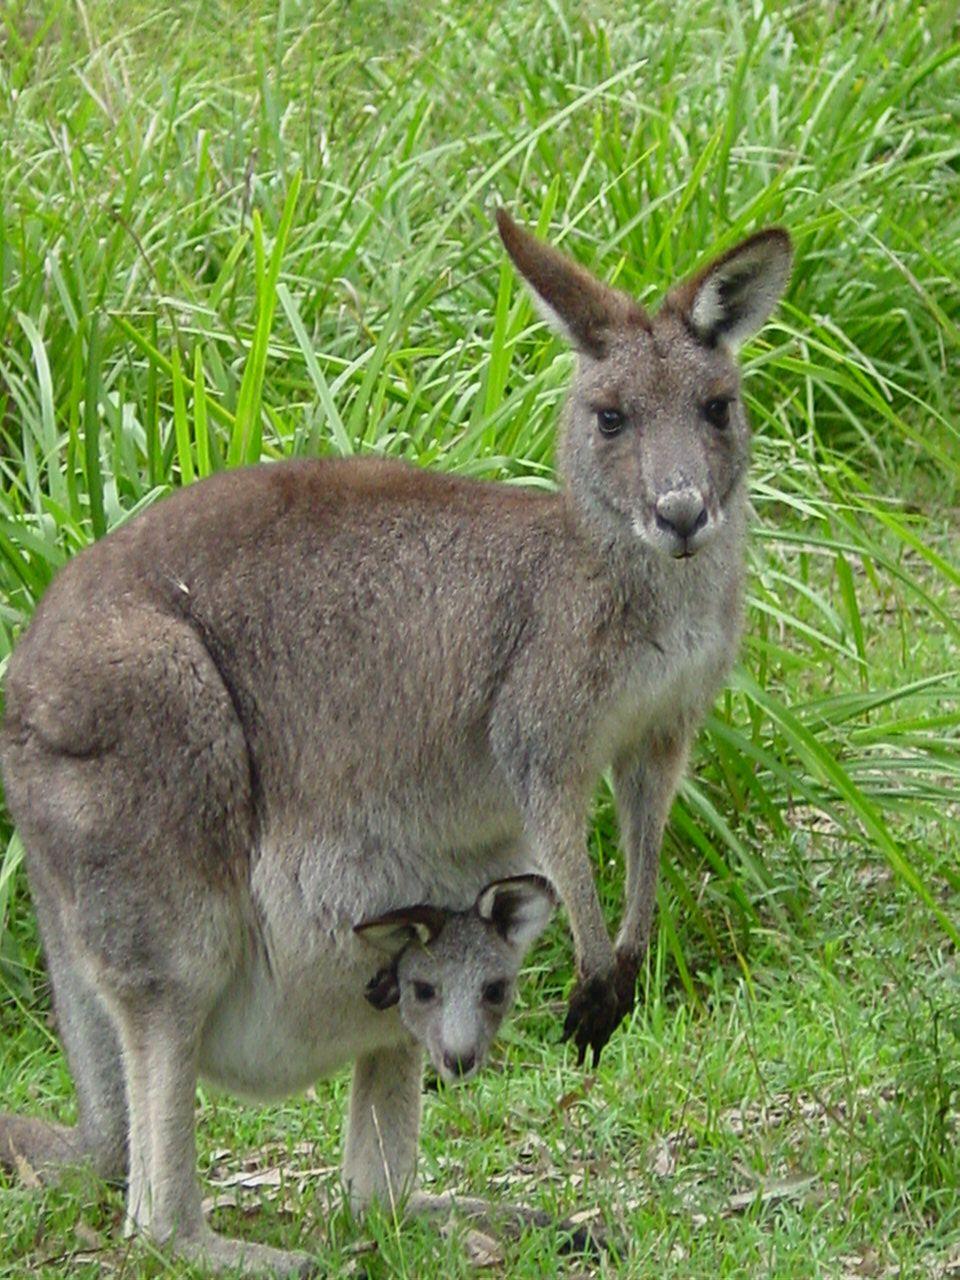 Australia Su Cultura Y Organizacion Wilde Dieren Kangoeroe Schattige Dieren